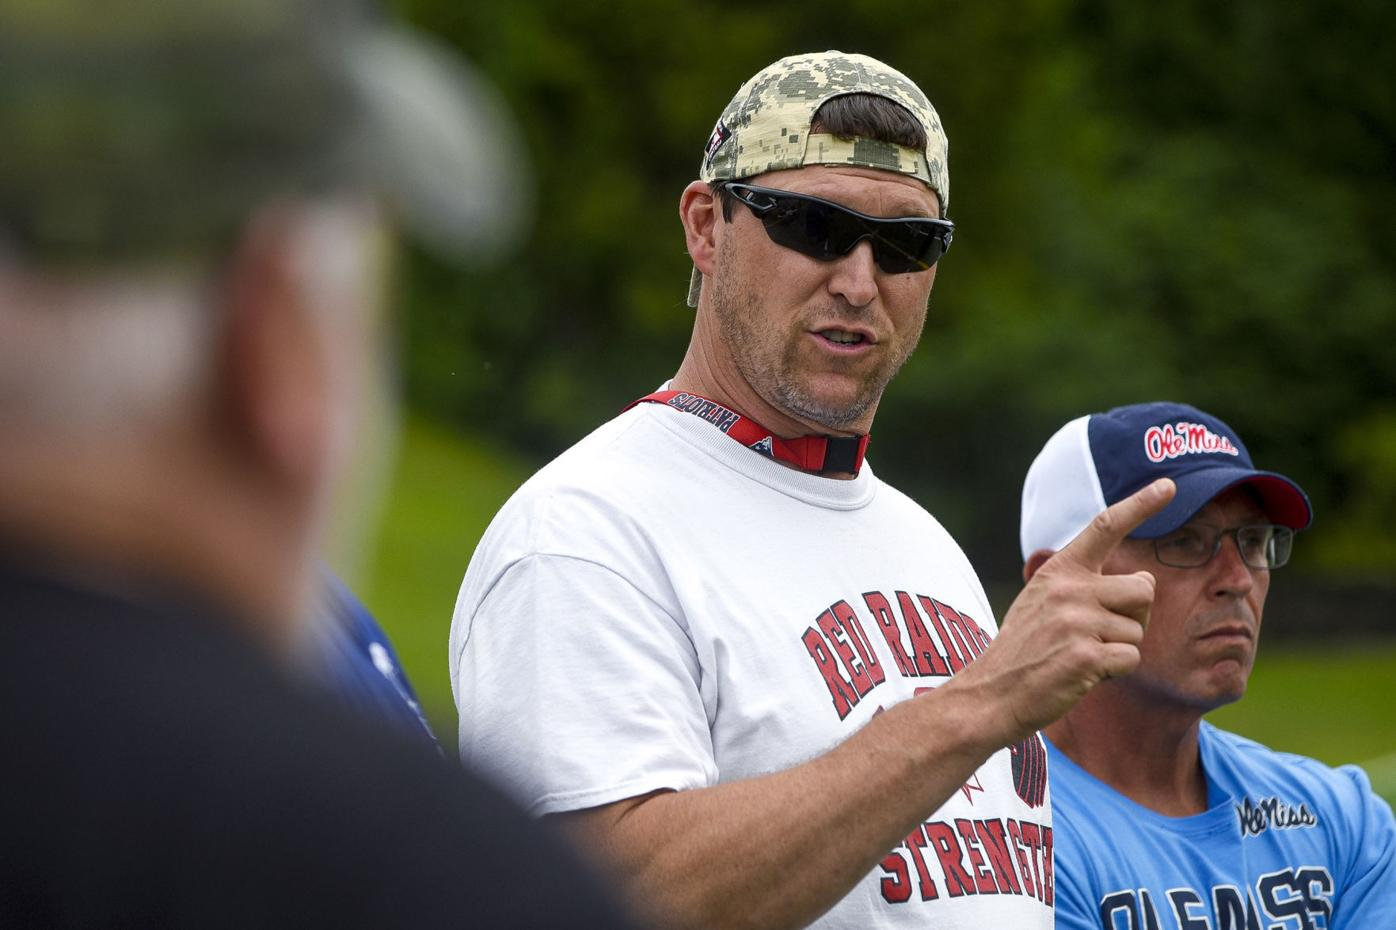 Team East head coach Kevin Hebert